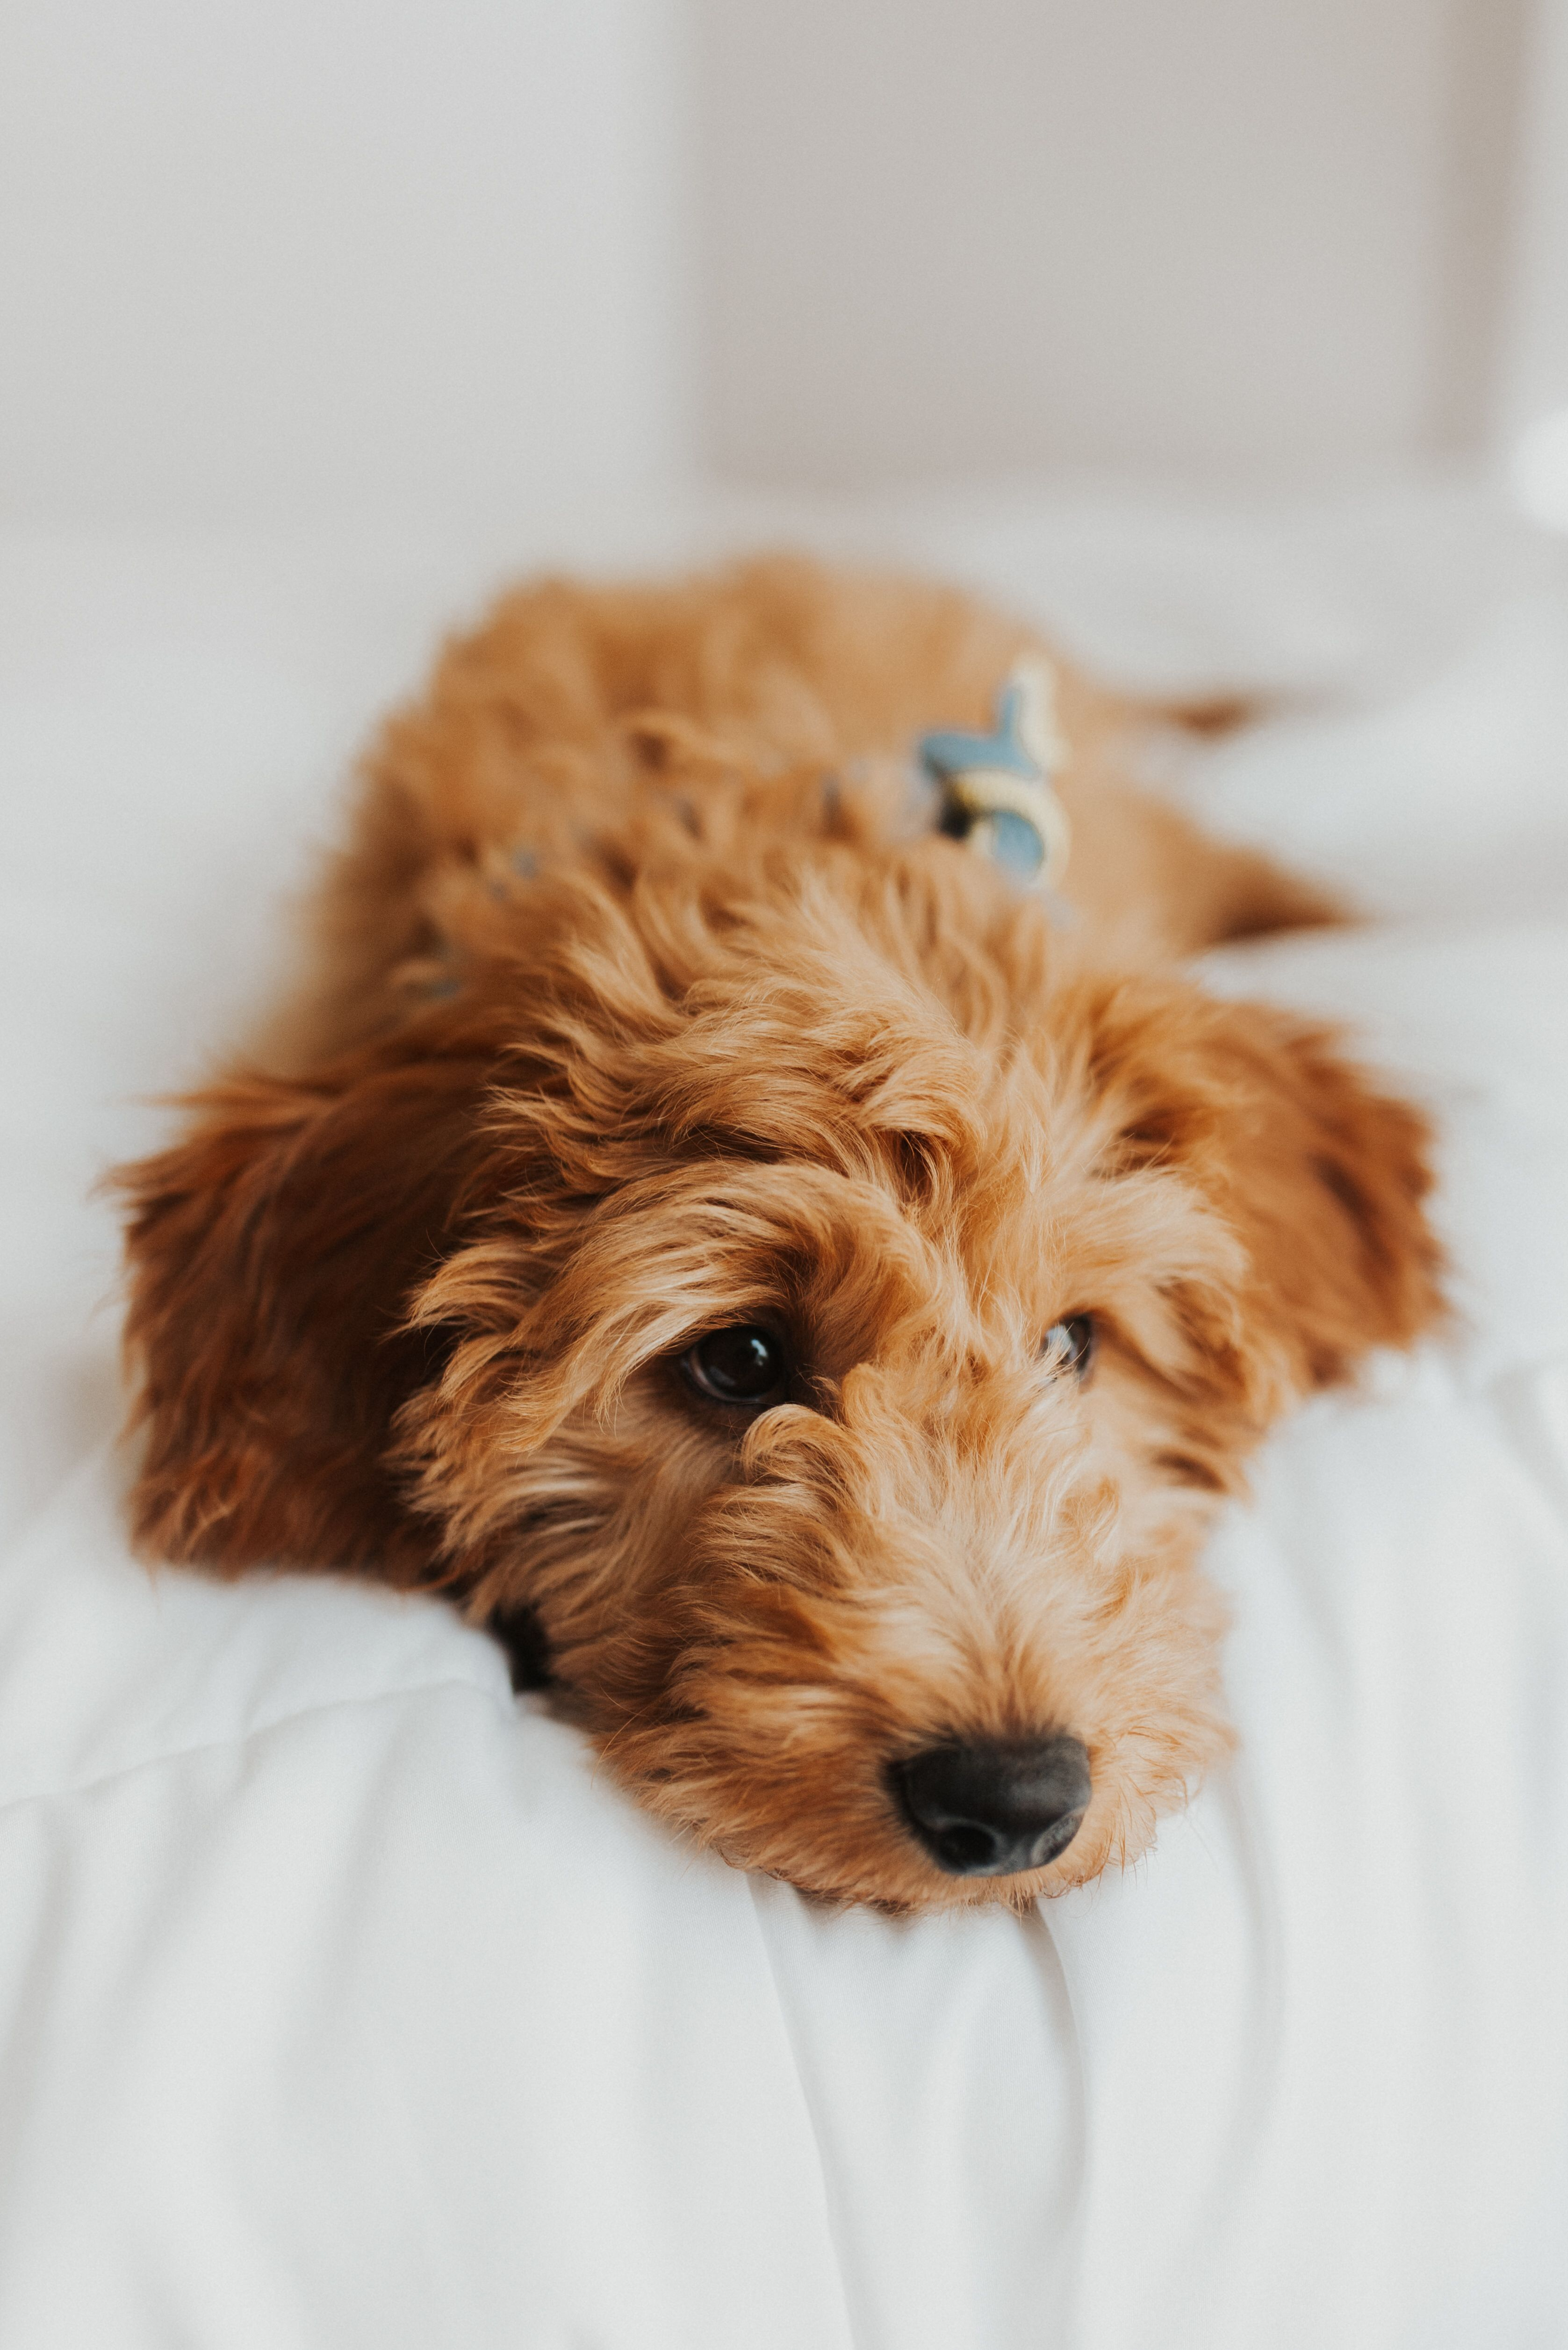 F1 goldendoodle mini goldendoodle puppy cute puppies